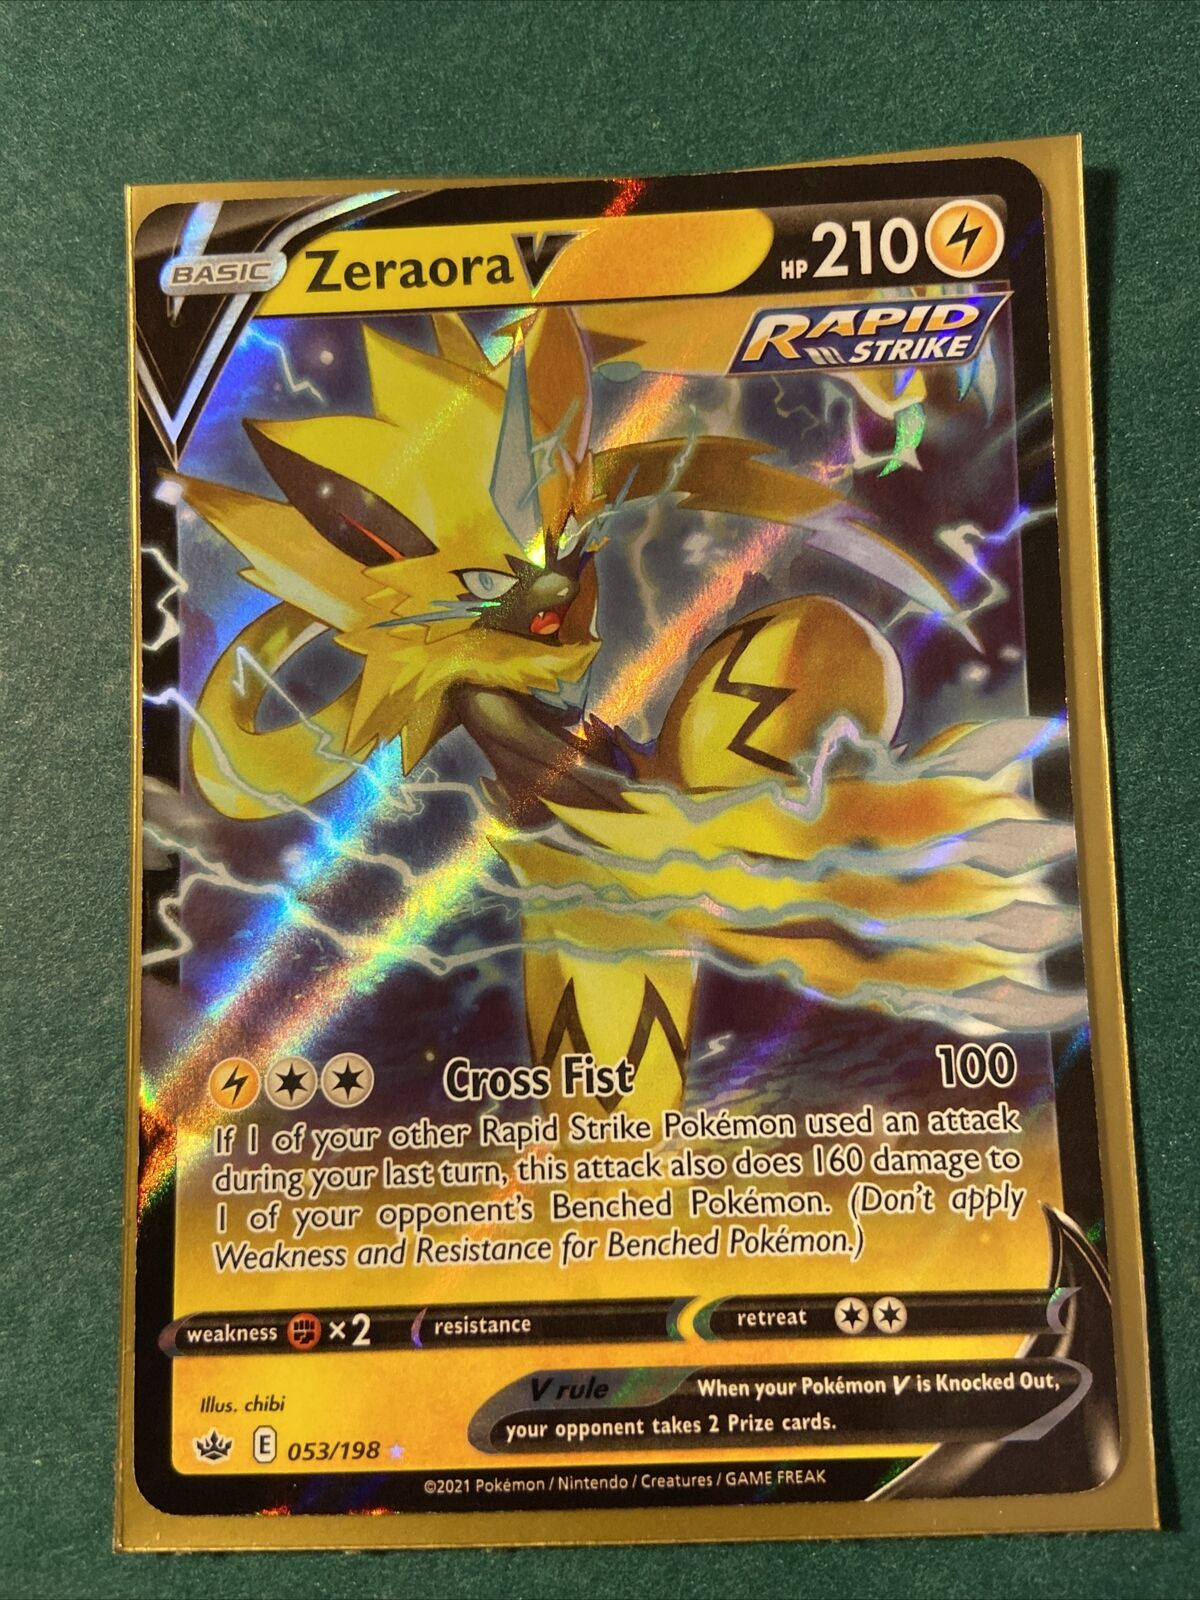 * NEW * ZERAORA V 053/198 53/198 Rapid Strike Chilling Reign Pokemon Card Mint